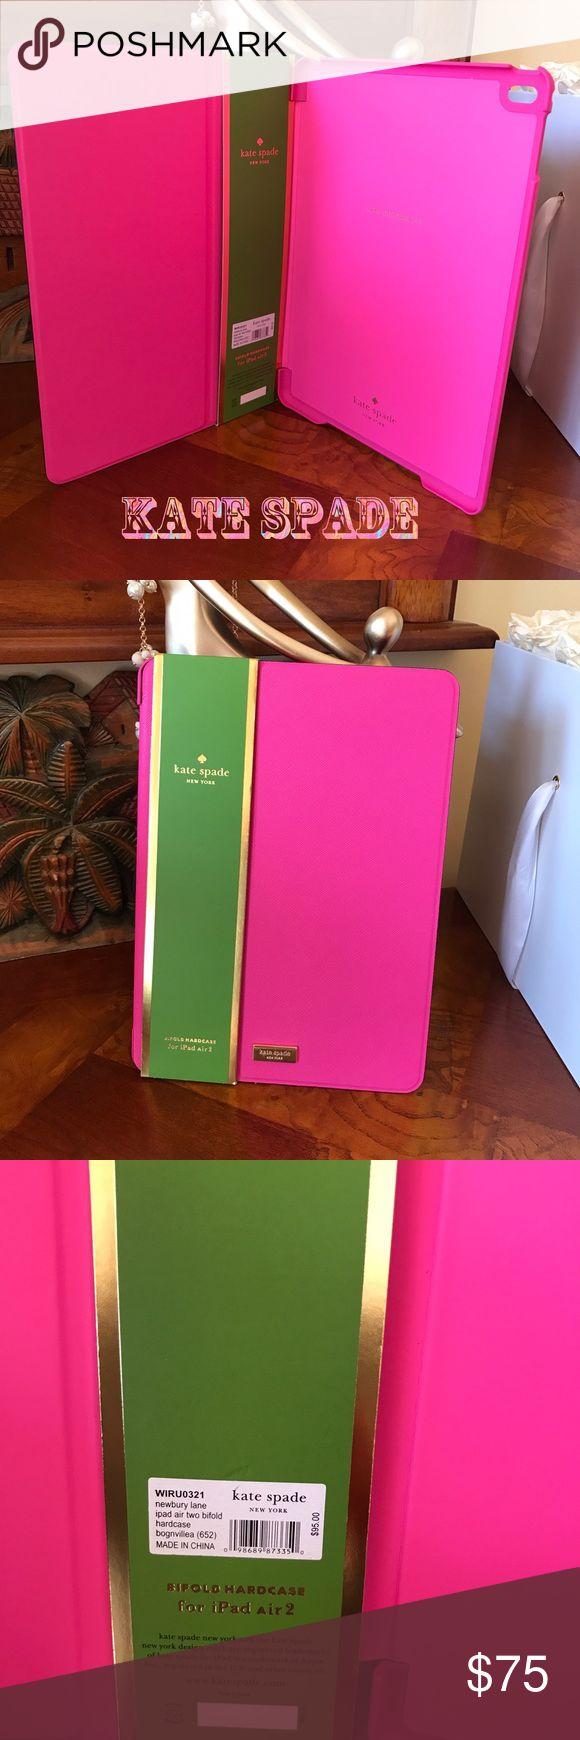 Kate spade iPad case Cute Bifold iPad Air 2 hot pink hard case. kate spade Accessories Laptop Cases